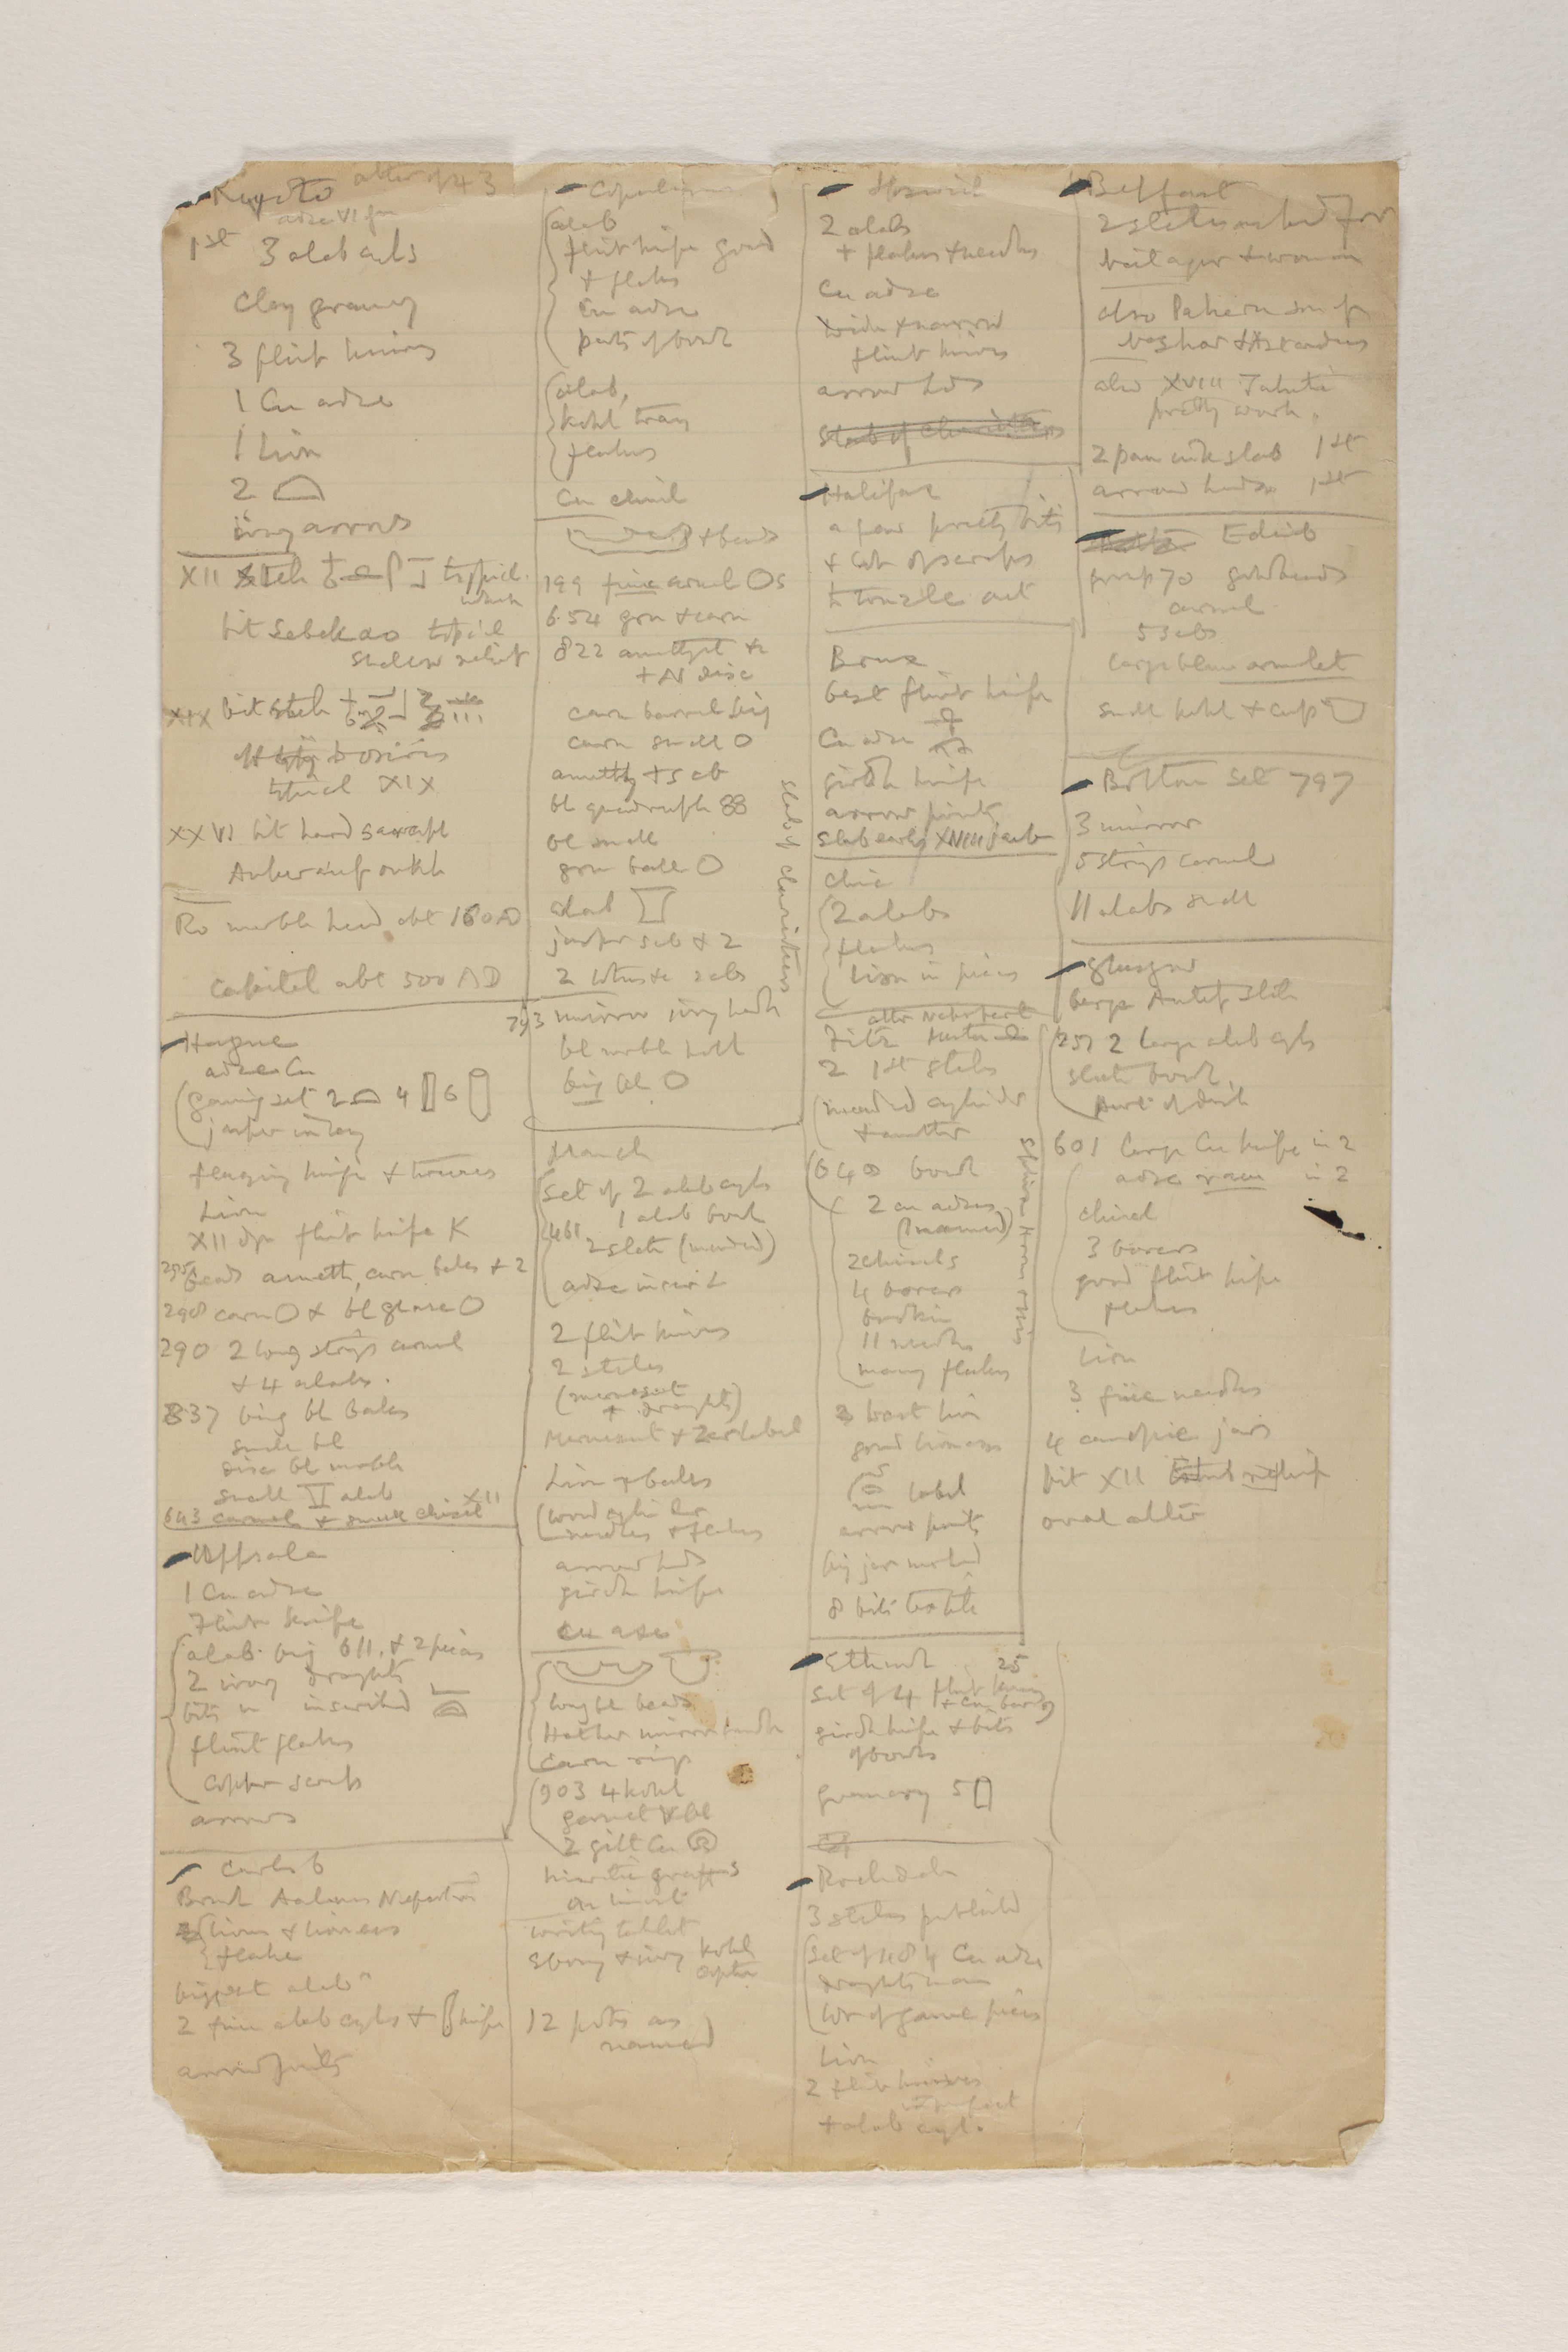 1919-21 Sedment, Lahun Multiple institution list PMA/WFP1/D/24/10.1